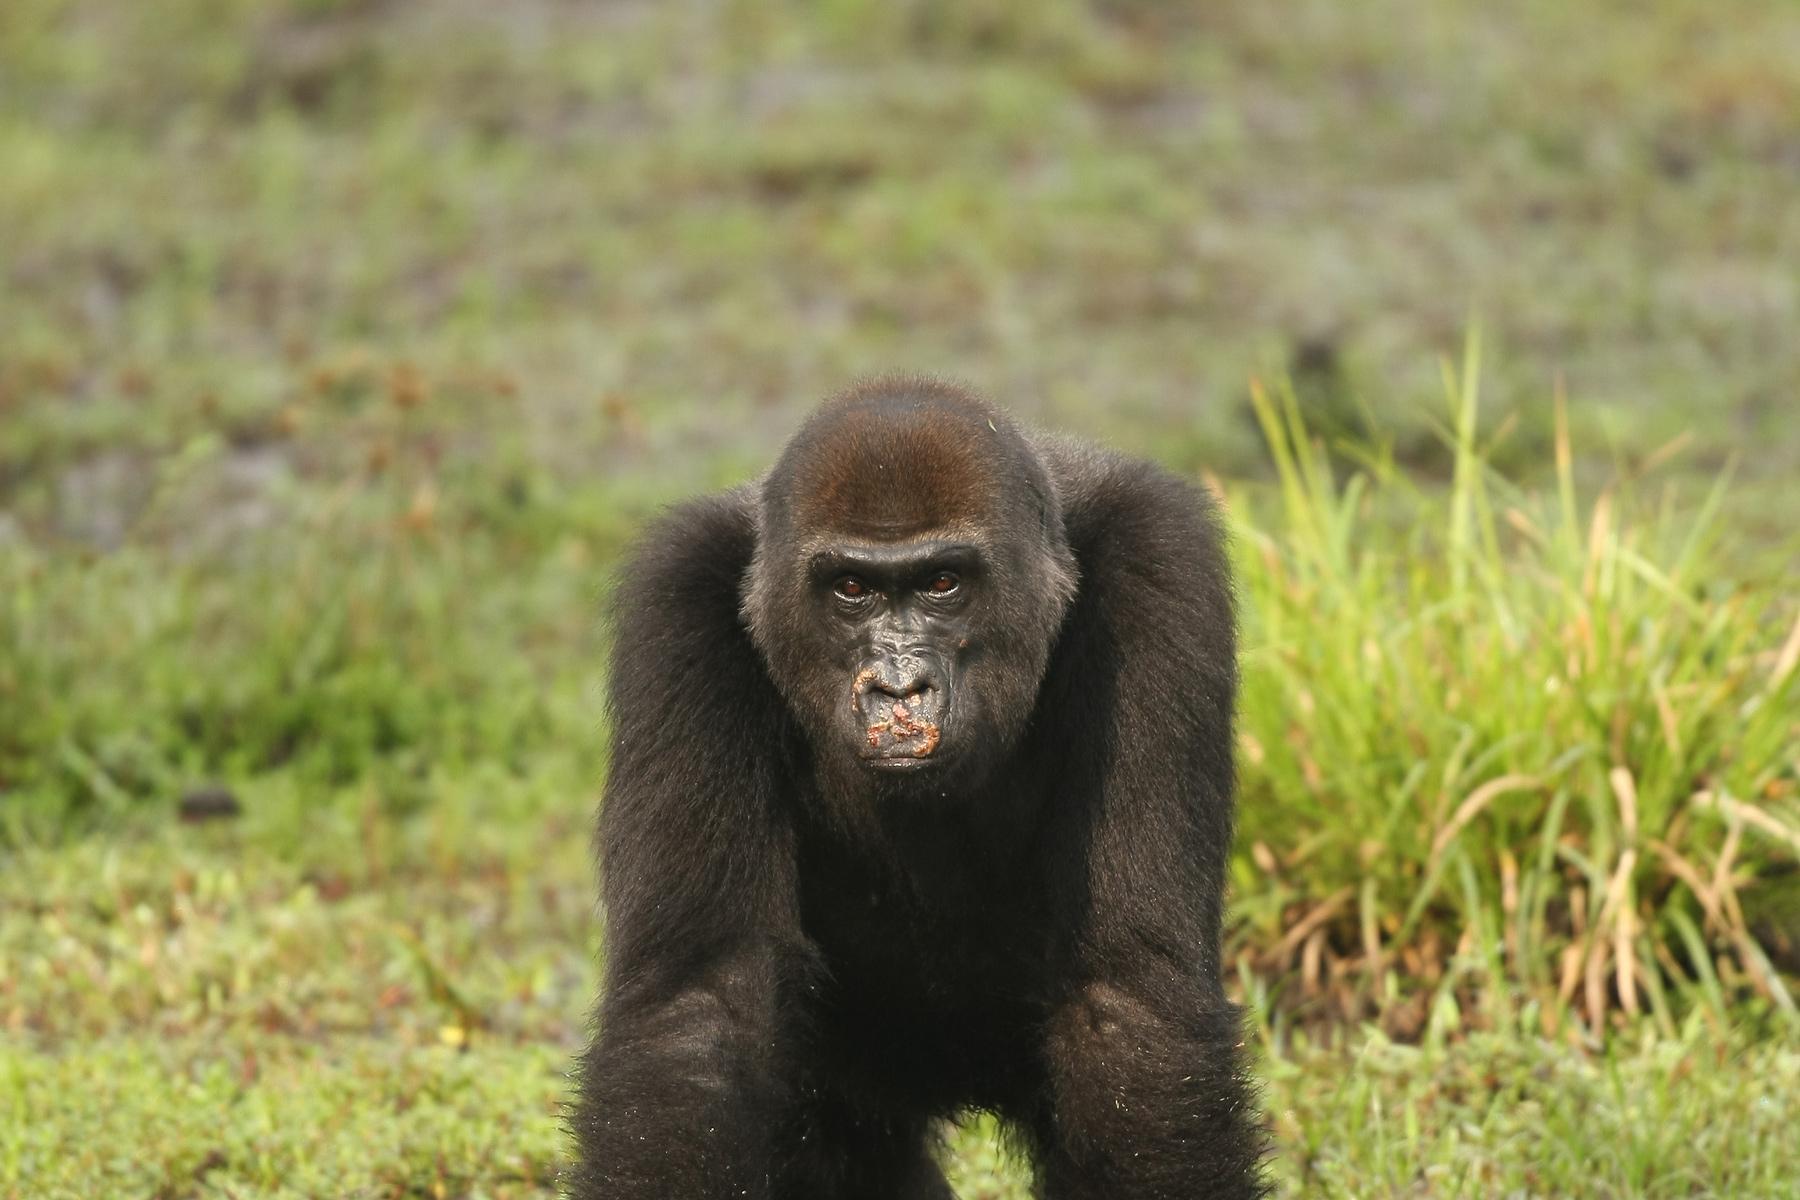 Female Gorillas Recognize And Respond To Contagious Disease